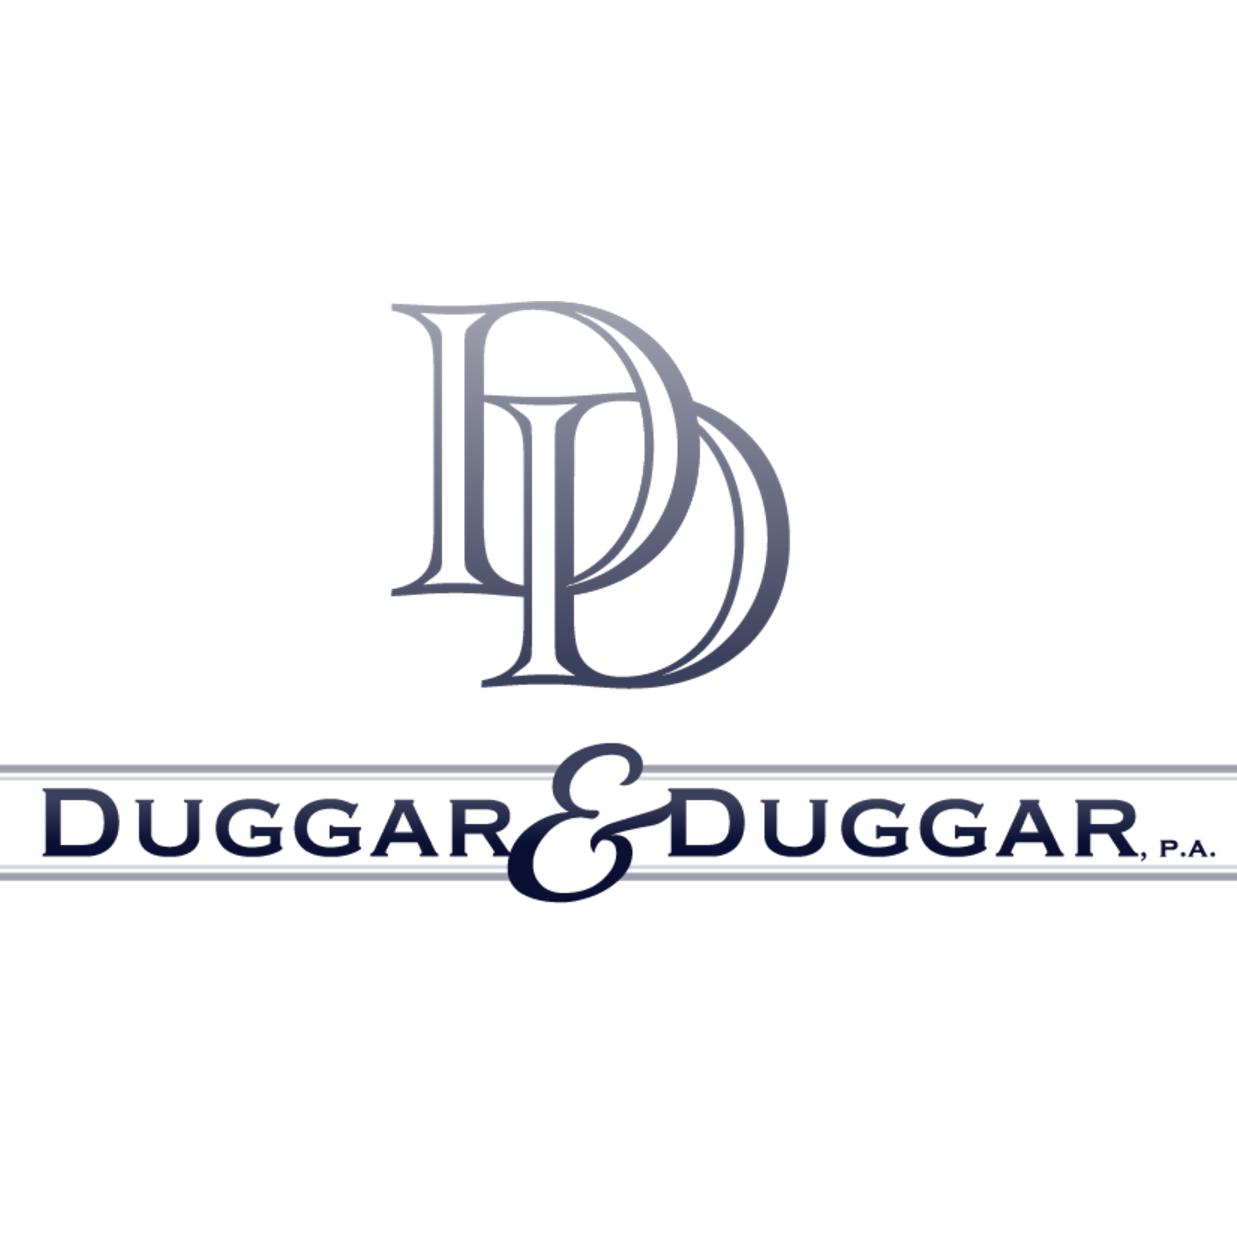 Duggar & Duggar